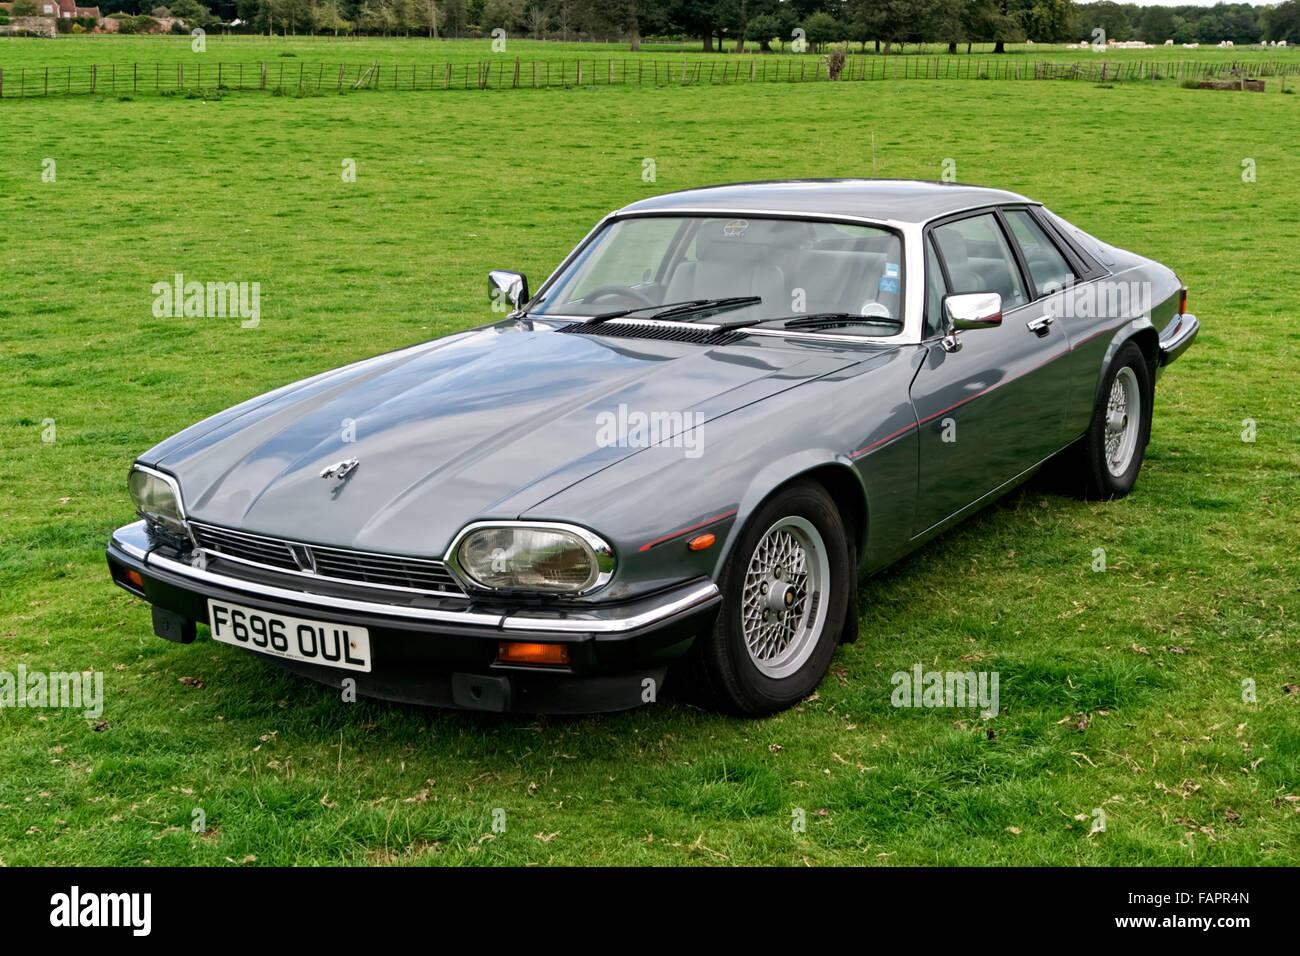 A Jaguar XJS 3.6 Litre Luxury Grand Tourer 2 Door Coupe At The Breamore  House